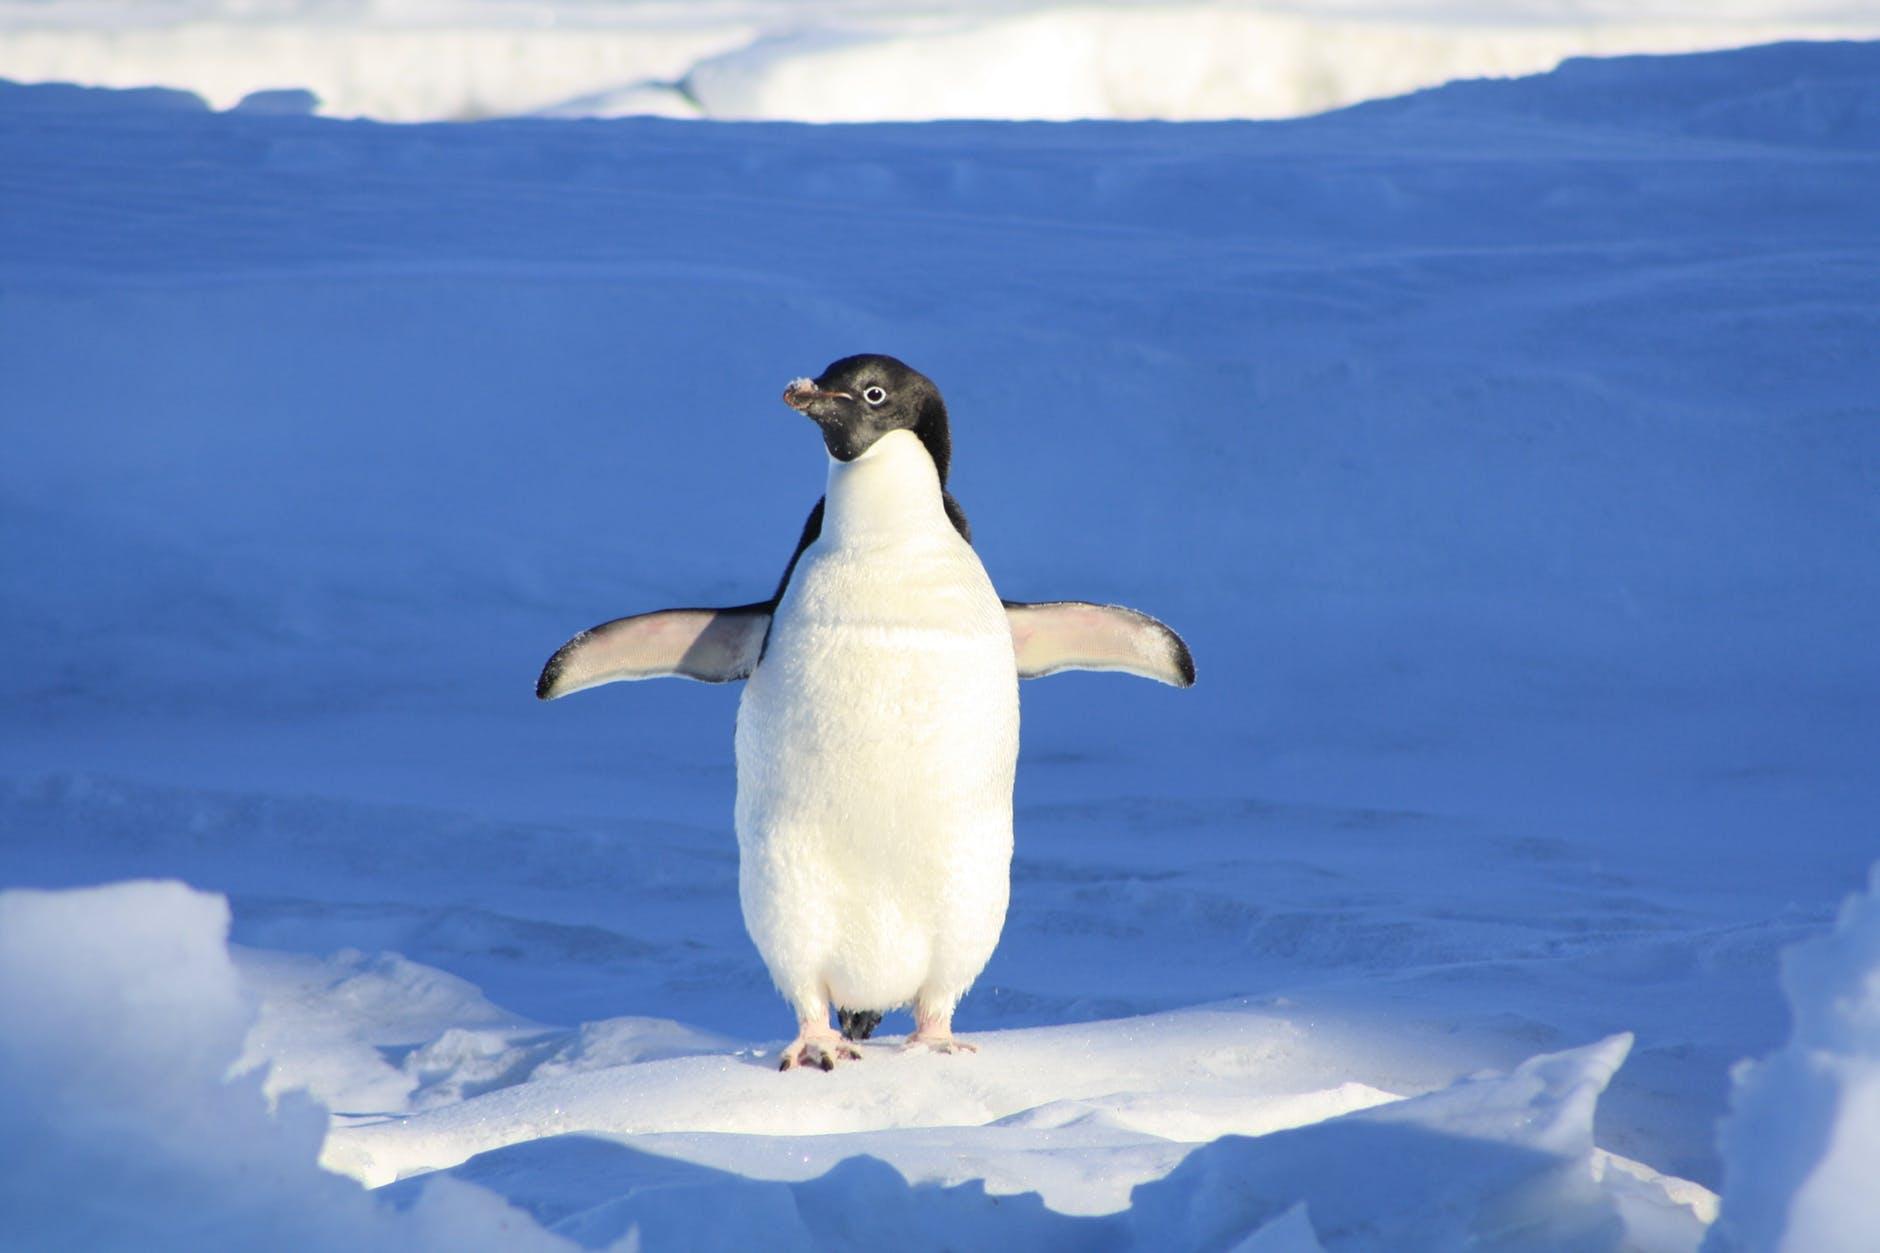 penguin-funny-blue-water-86405.jpeg